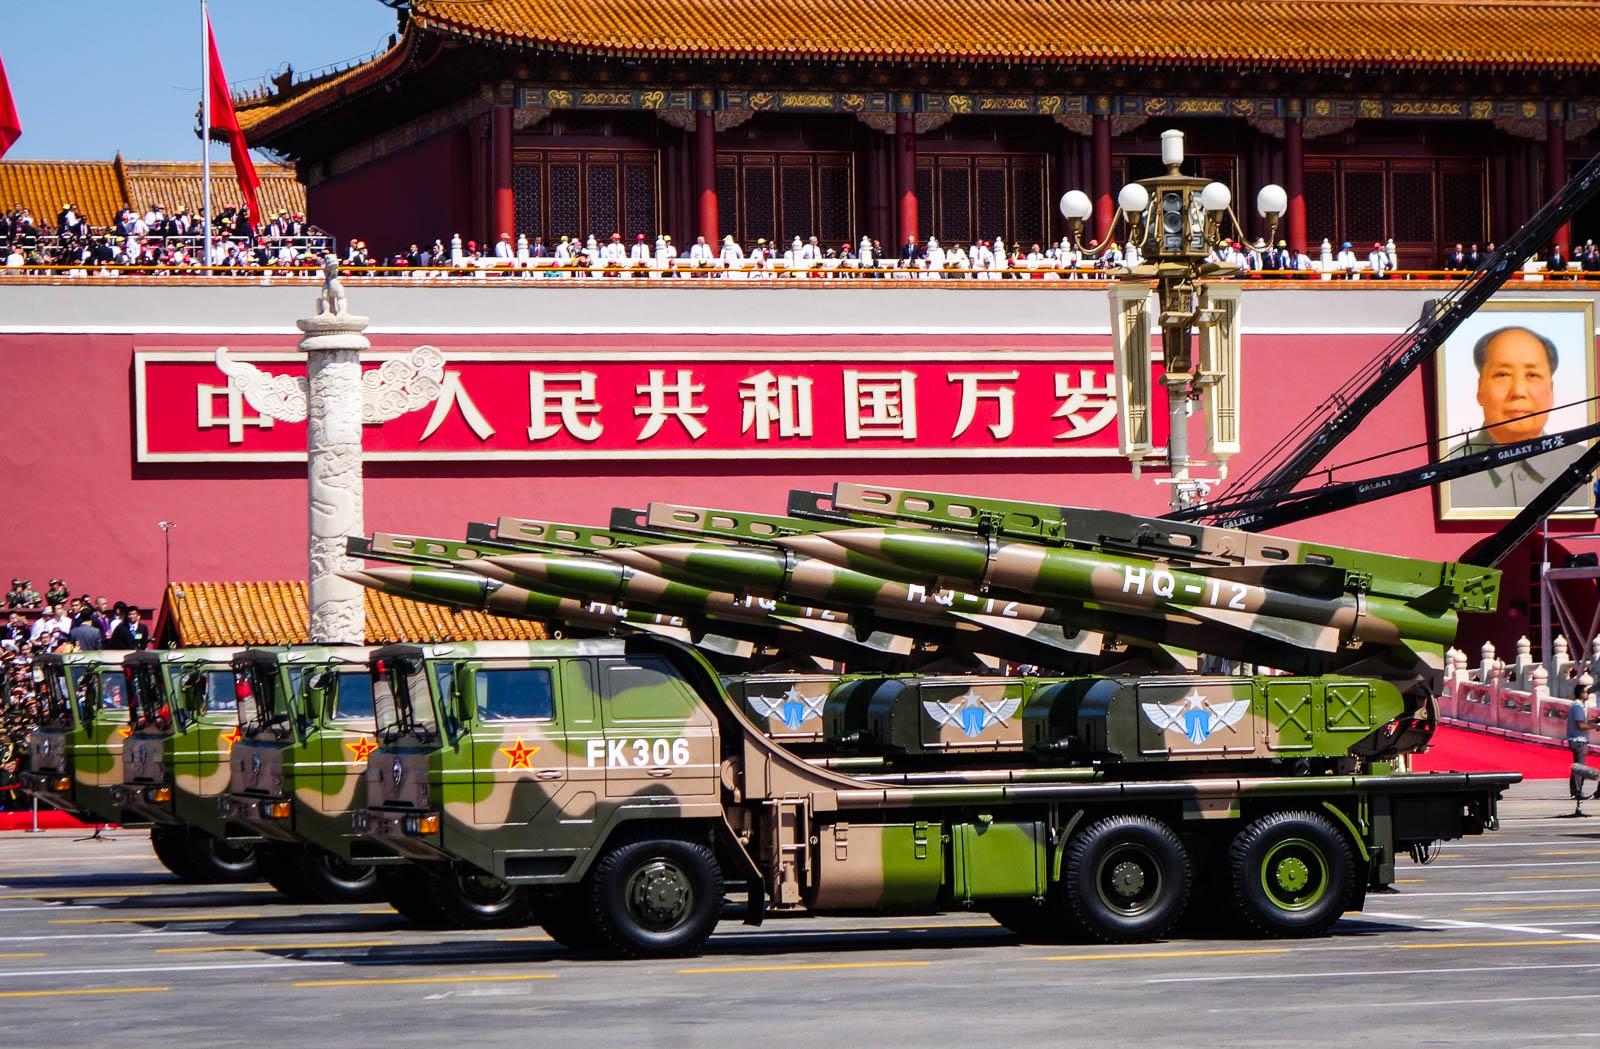 beijing-china-military-parade-2015-35